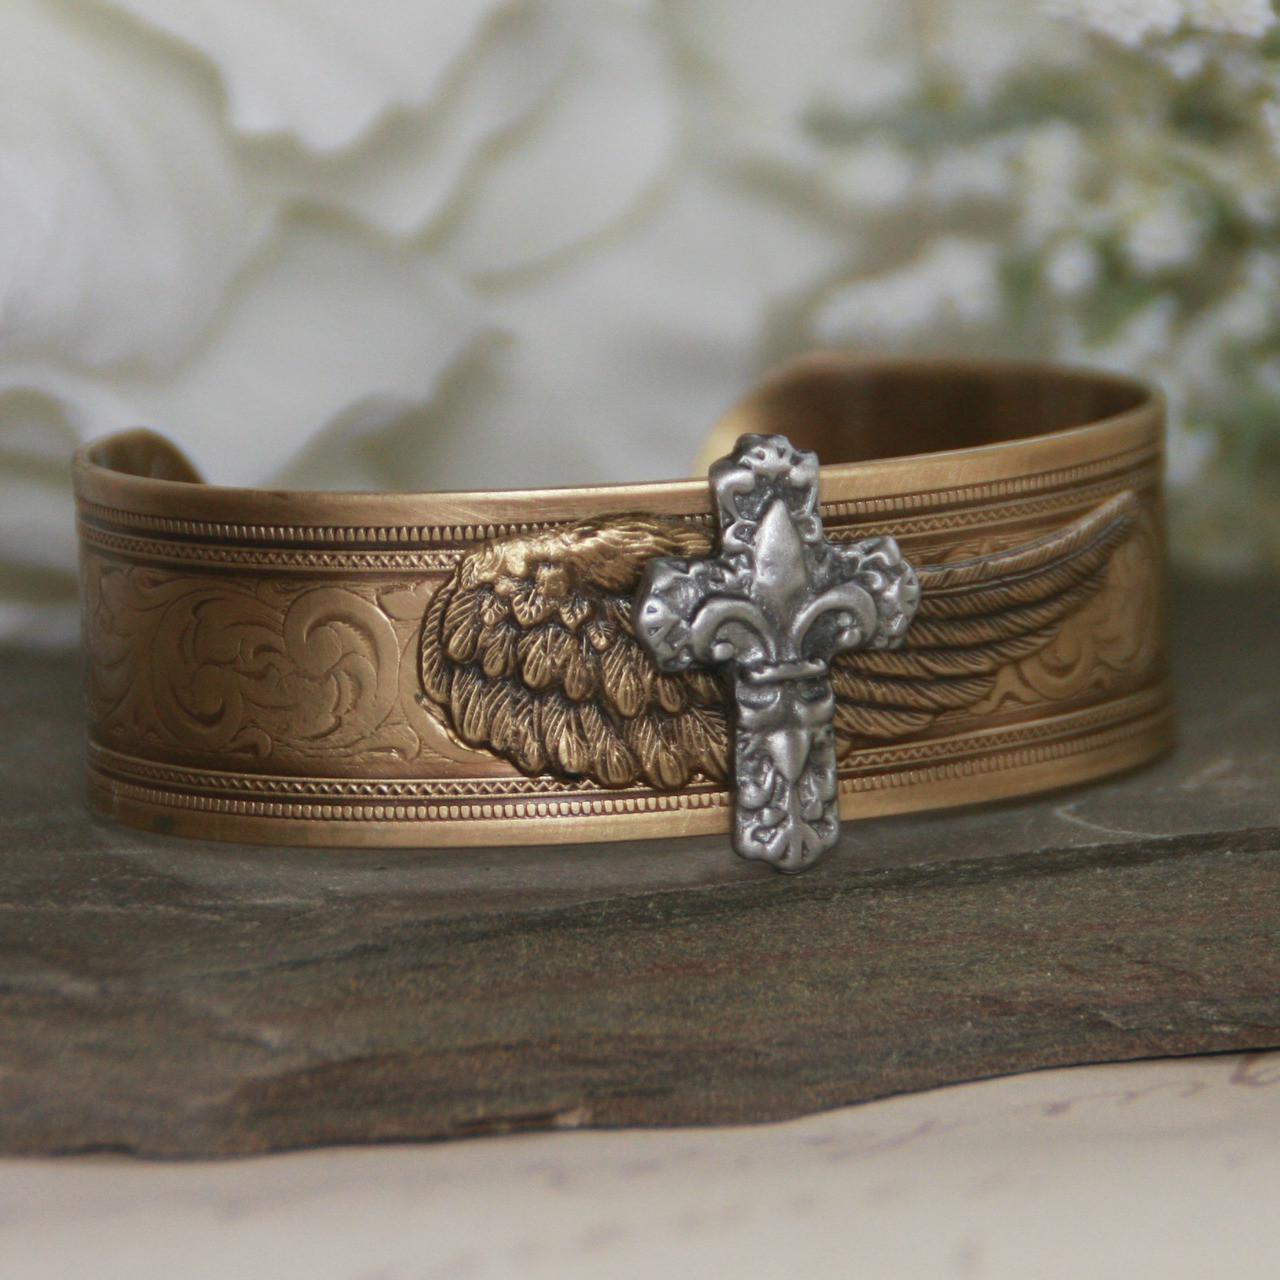 ART-140  Wings and a Prayer Cuff Bracelet